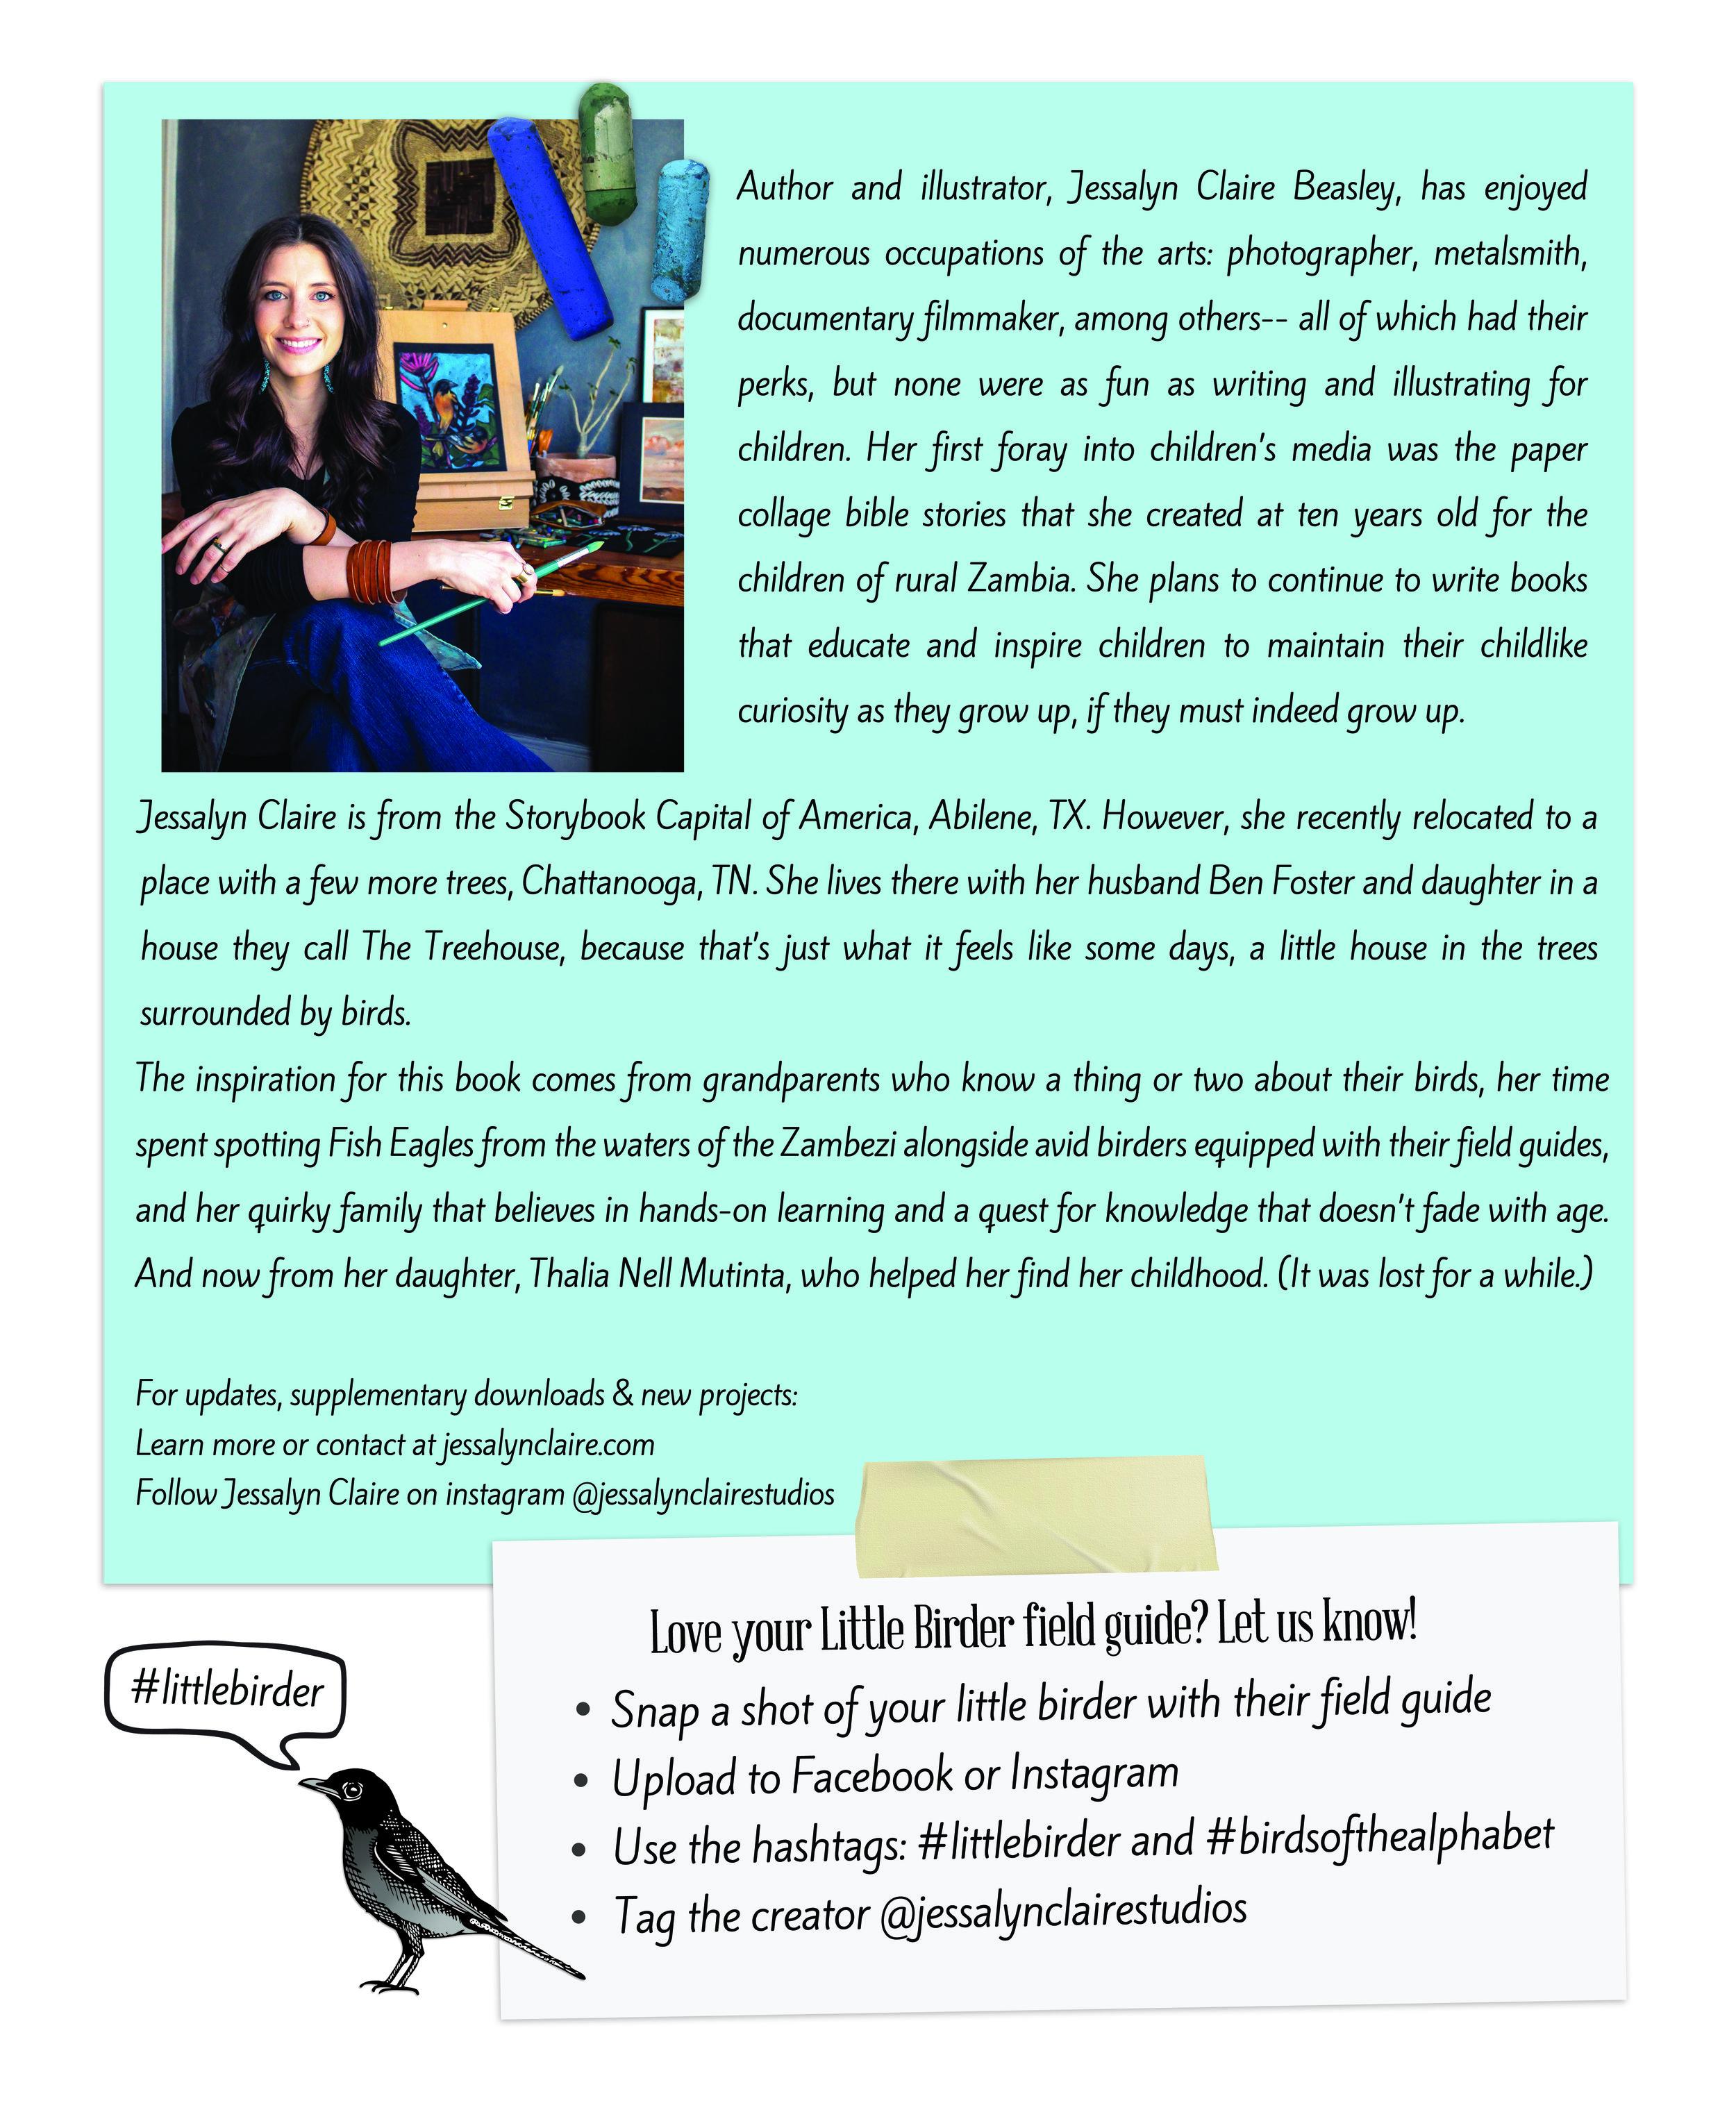 Little Birder Author and Illustrator: Jessalyn Claire Beasley